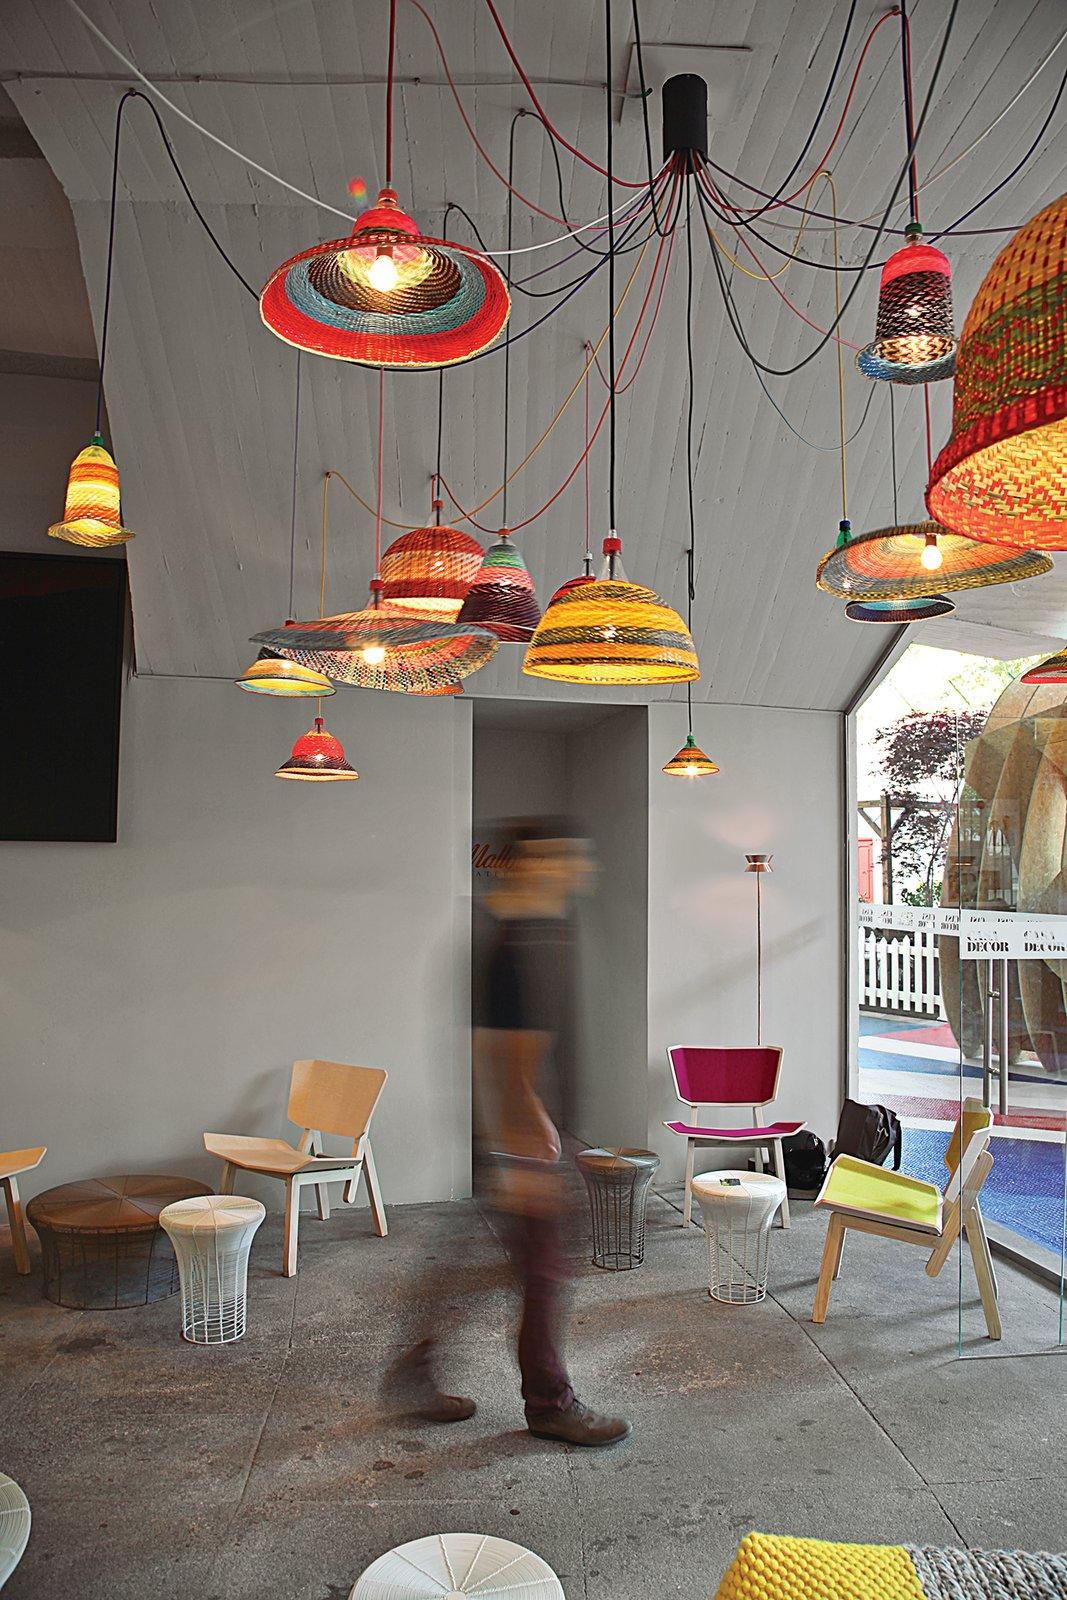 #lightingdesign #lighting #Columbia #lamps #Madrid #Spain #Spanish #AlvaroCatalandeOcon #furniture #designer #coffeetable #chair #concrete #indoor #interior #inside #PETlamp #weaving #green #ecofriendly 60+ Modern Lighting Solutions by Dwell